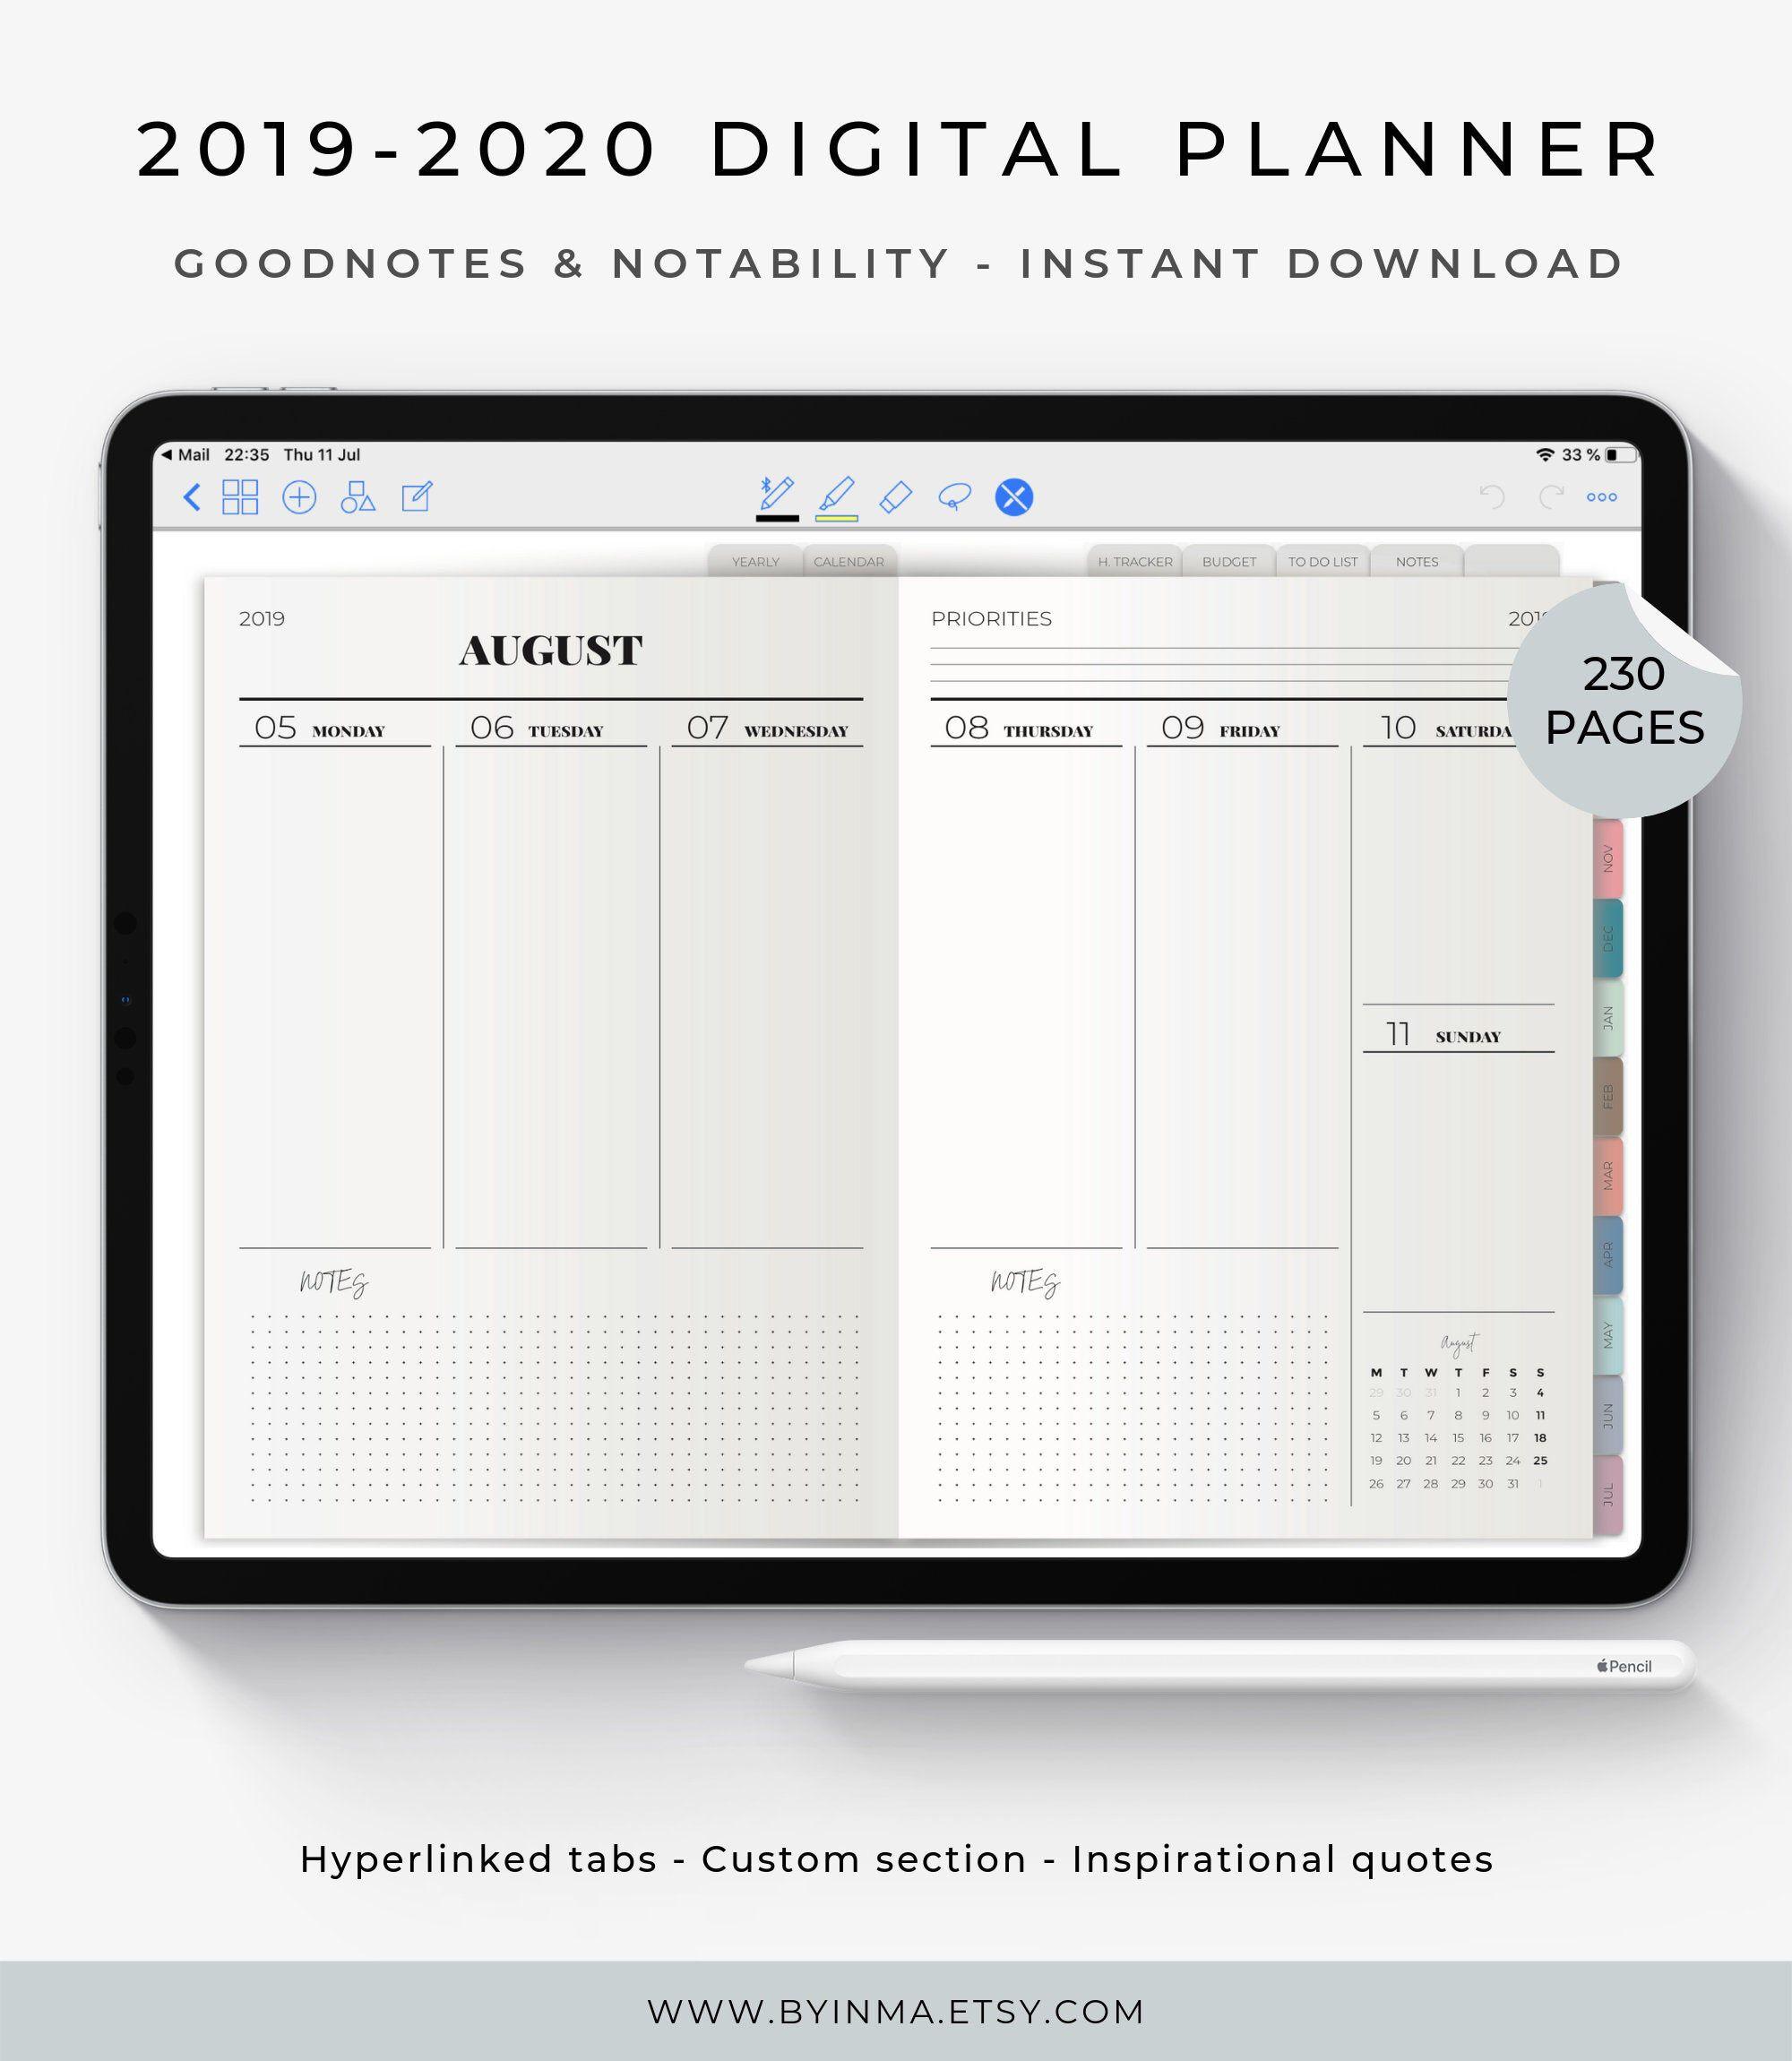 Digital Planner 2019 2020 Ipad Planner Goodnotes Planner Notability Planner Tablet Planner Goodnotes Template Academic Planner Digital Planner Academic Planner Planner